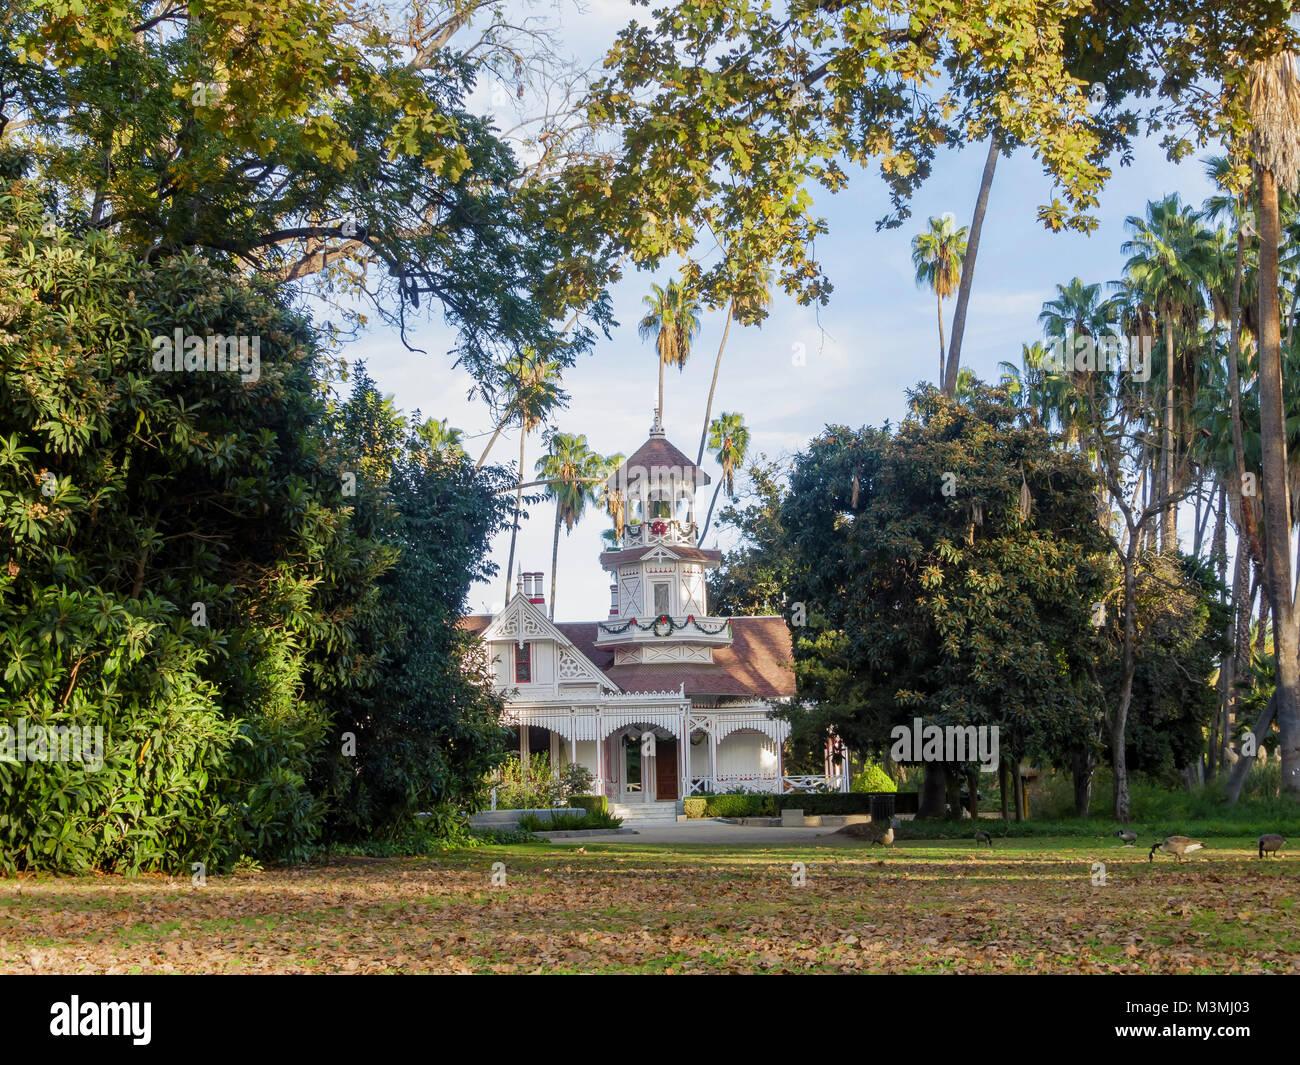 The Beautiful Queen Anne Cottage At Los Angeles County Arboretum U0026 Botanicu2026